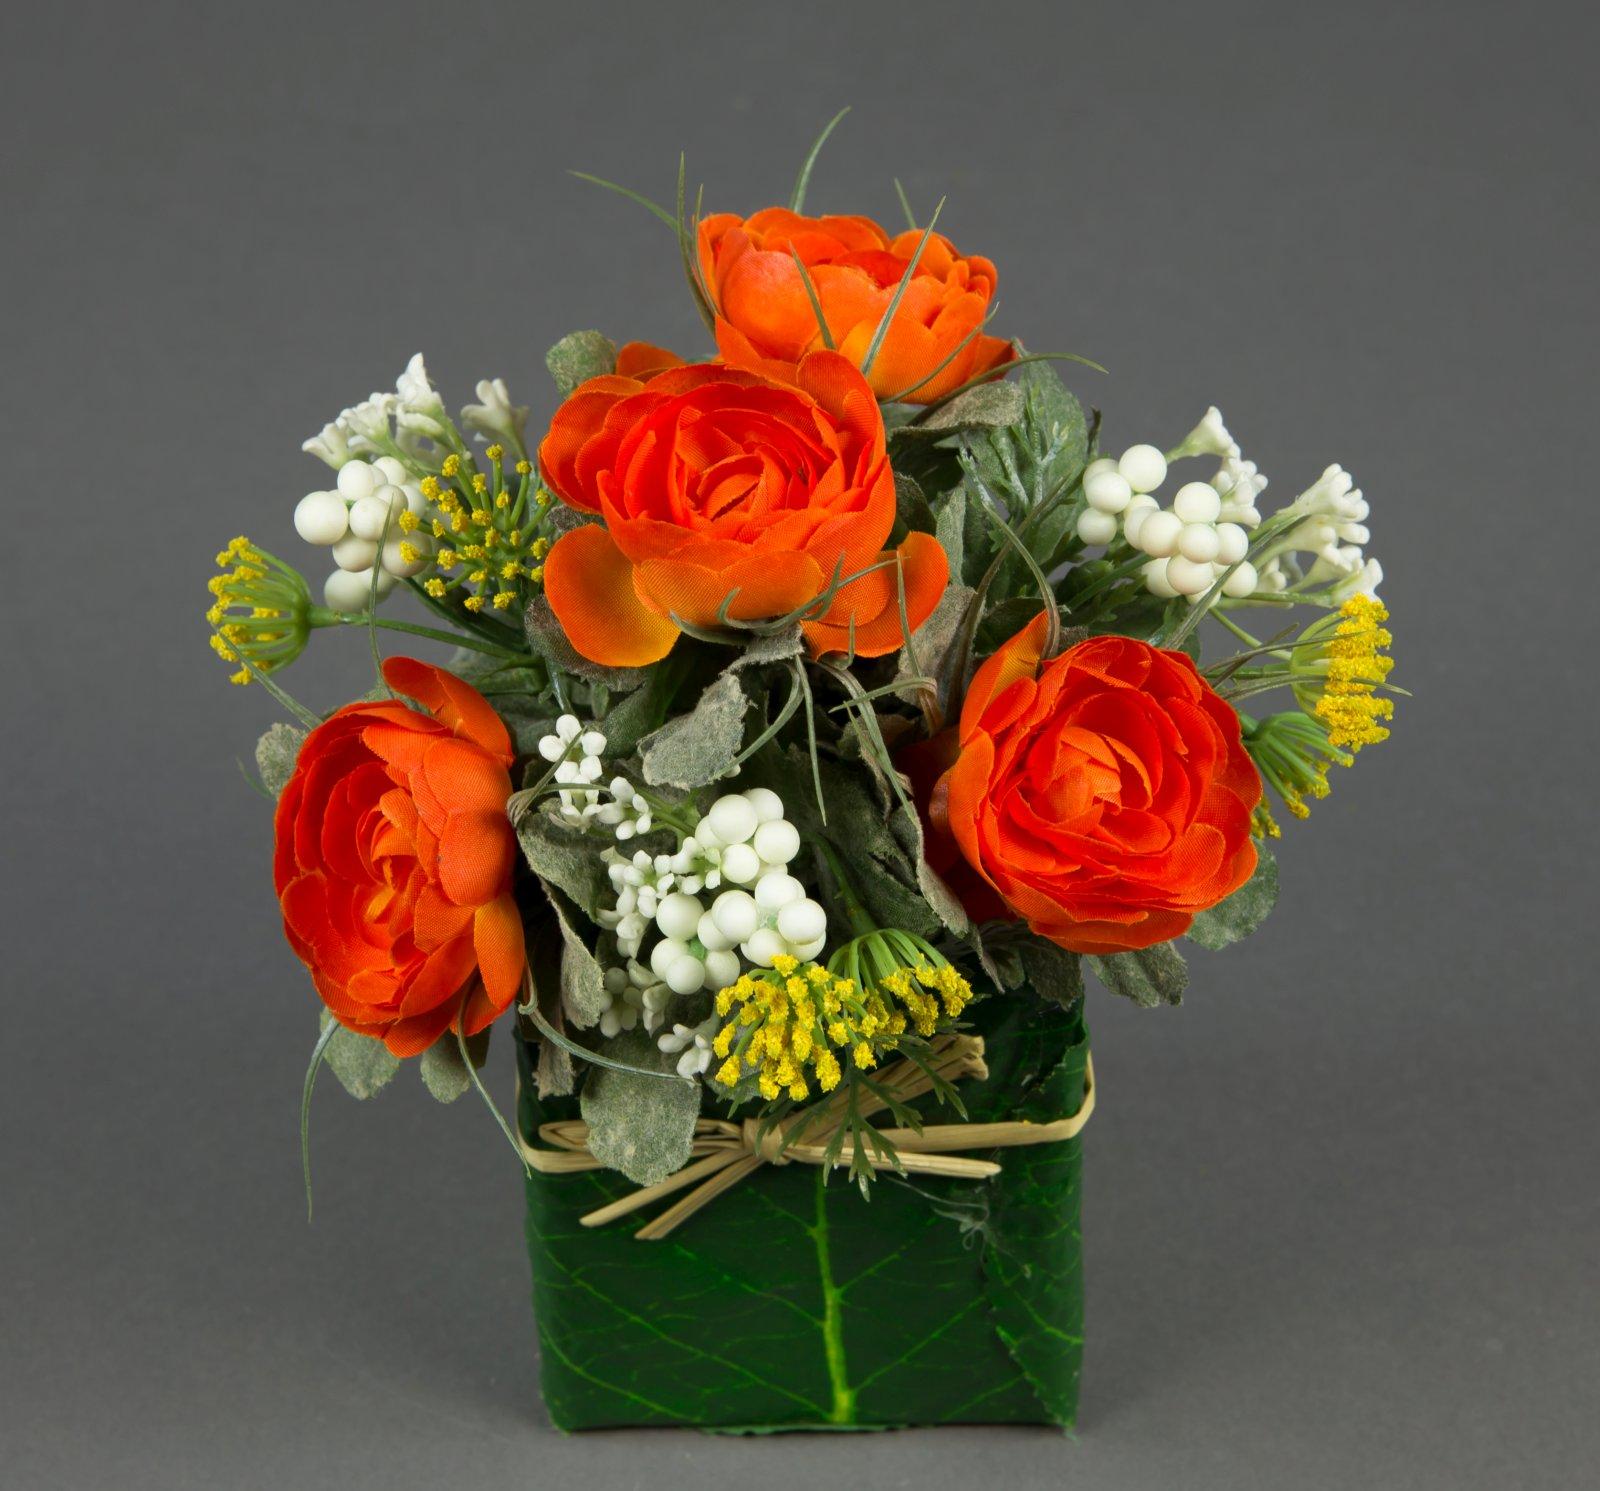 ranunkelgesteck 20x16cm orange lm kunstblumen k nstliche blumen ranunkel gesteck ebay. Black Bedroom Furniture Sets. Home Design Ideas